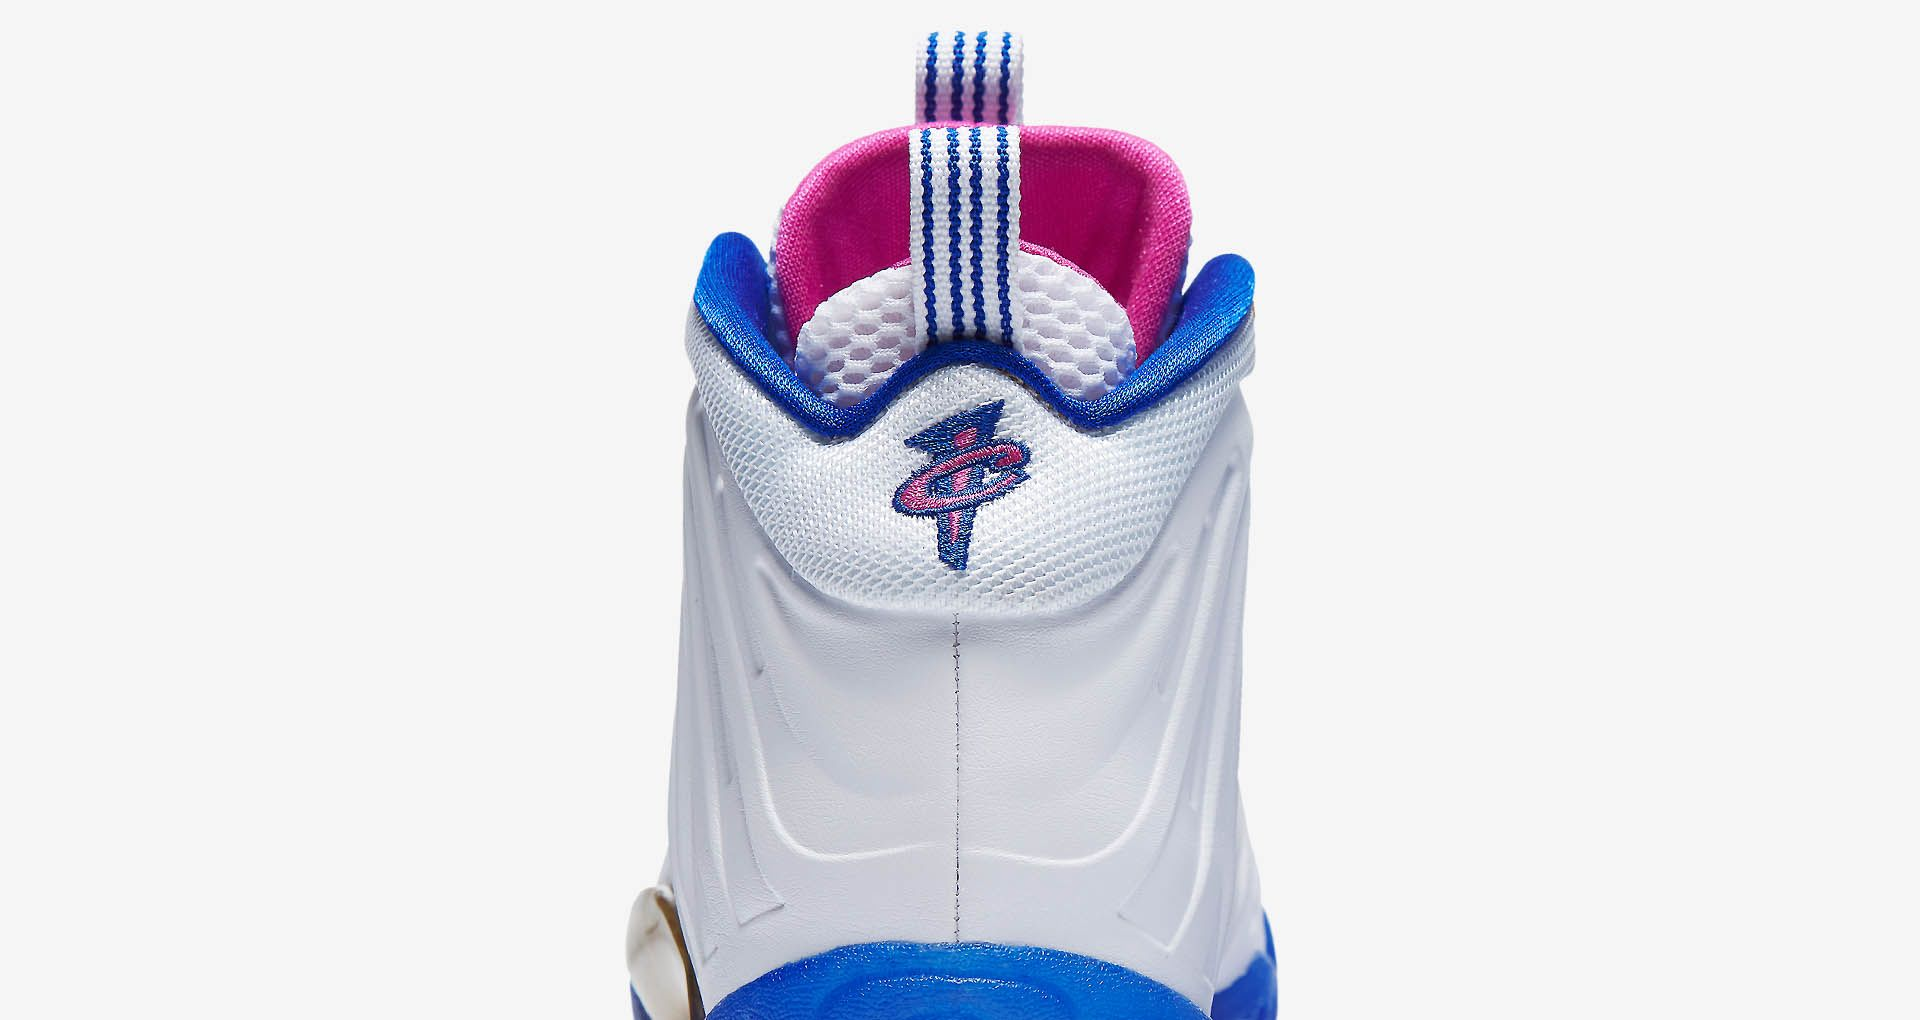 hot sale online df64d 851db Nike Little Posite One 'White & Fuchsia Blast' Release Date ...